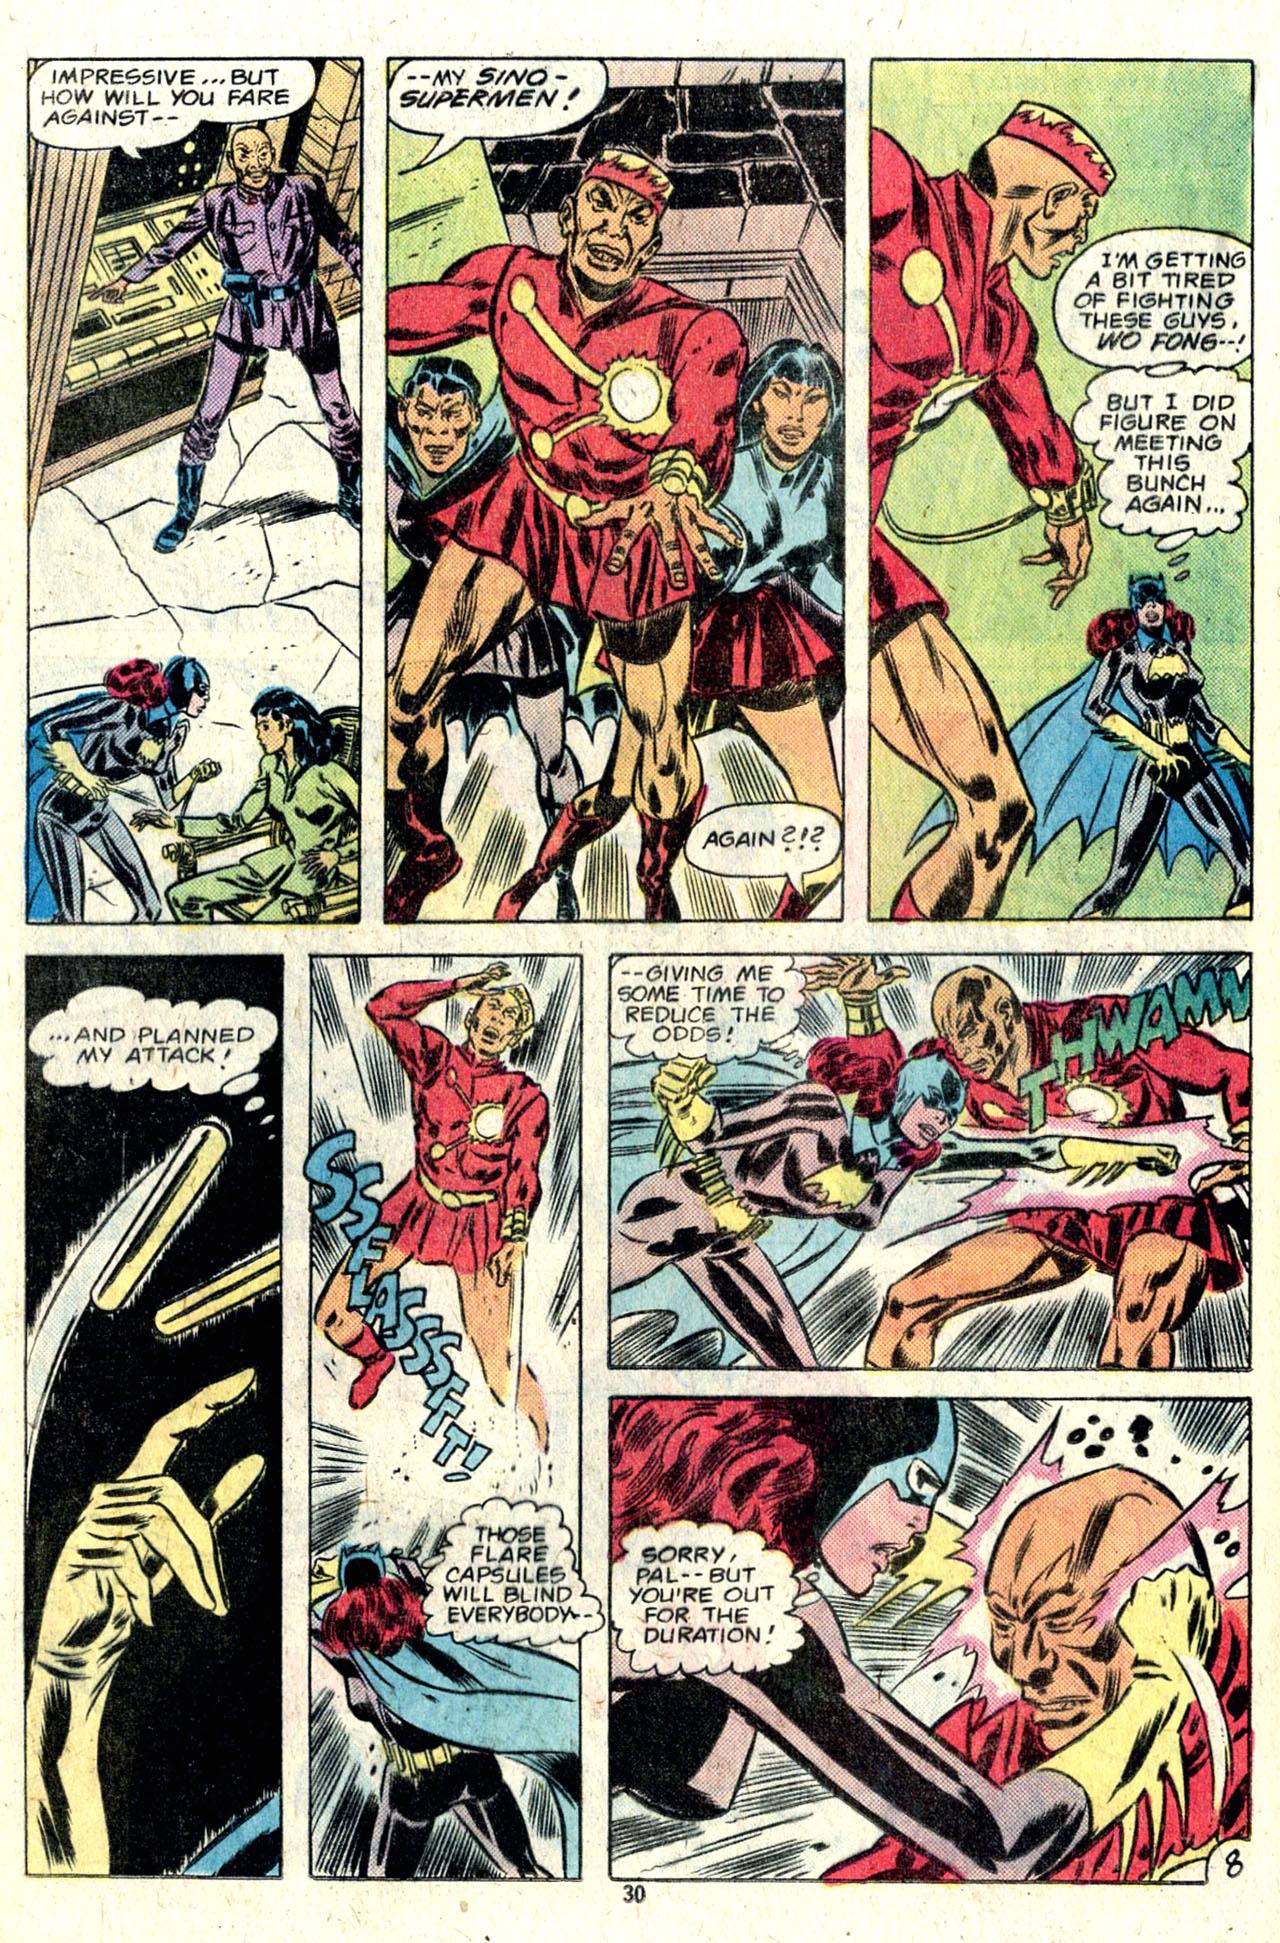 Detective Comics (1937) 482 Page 30